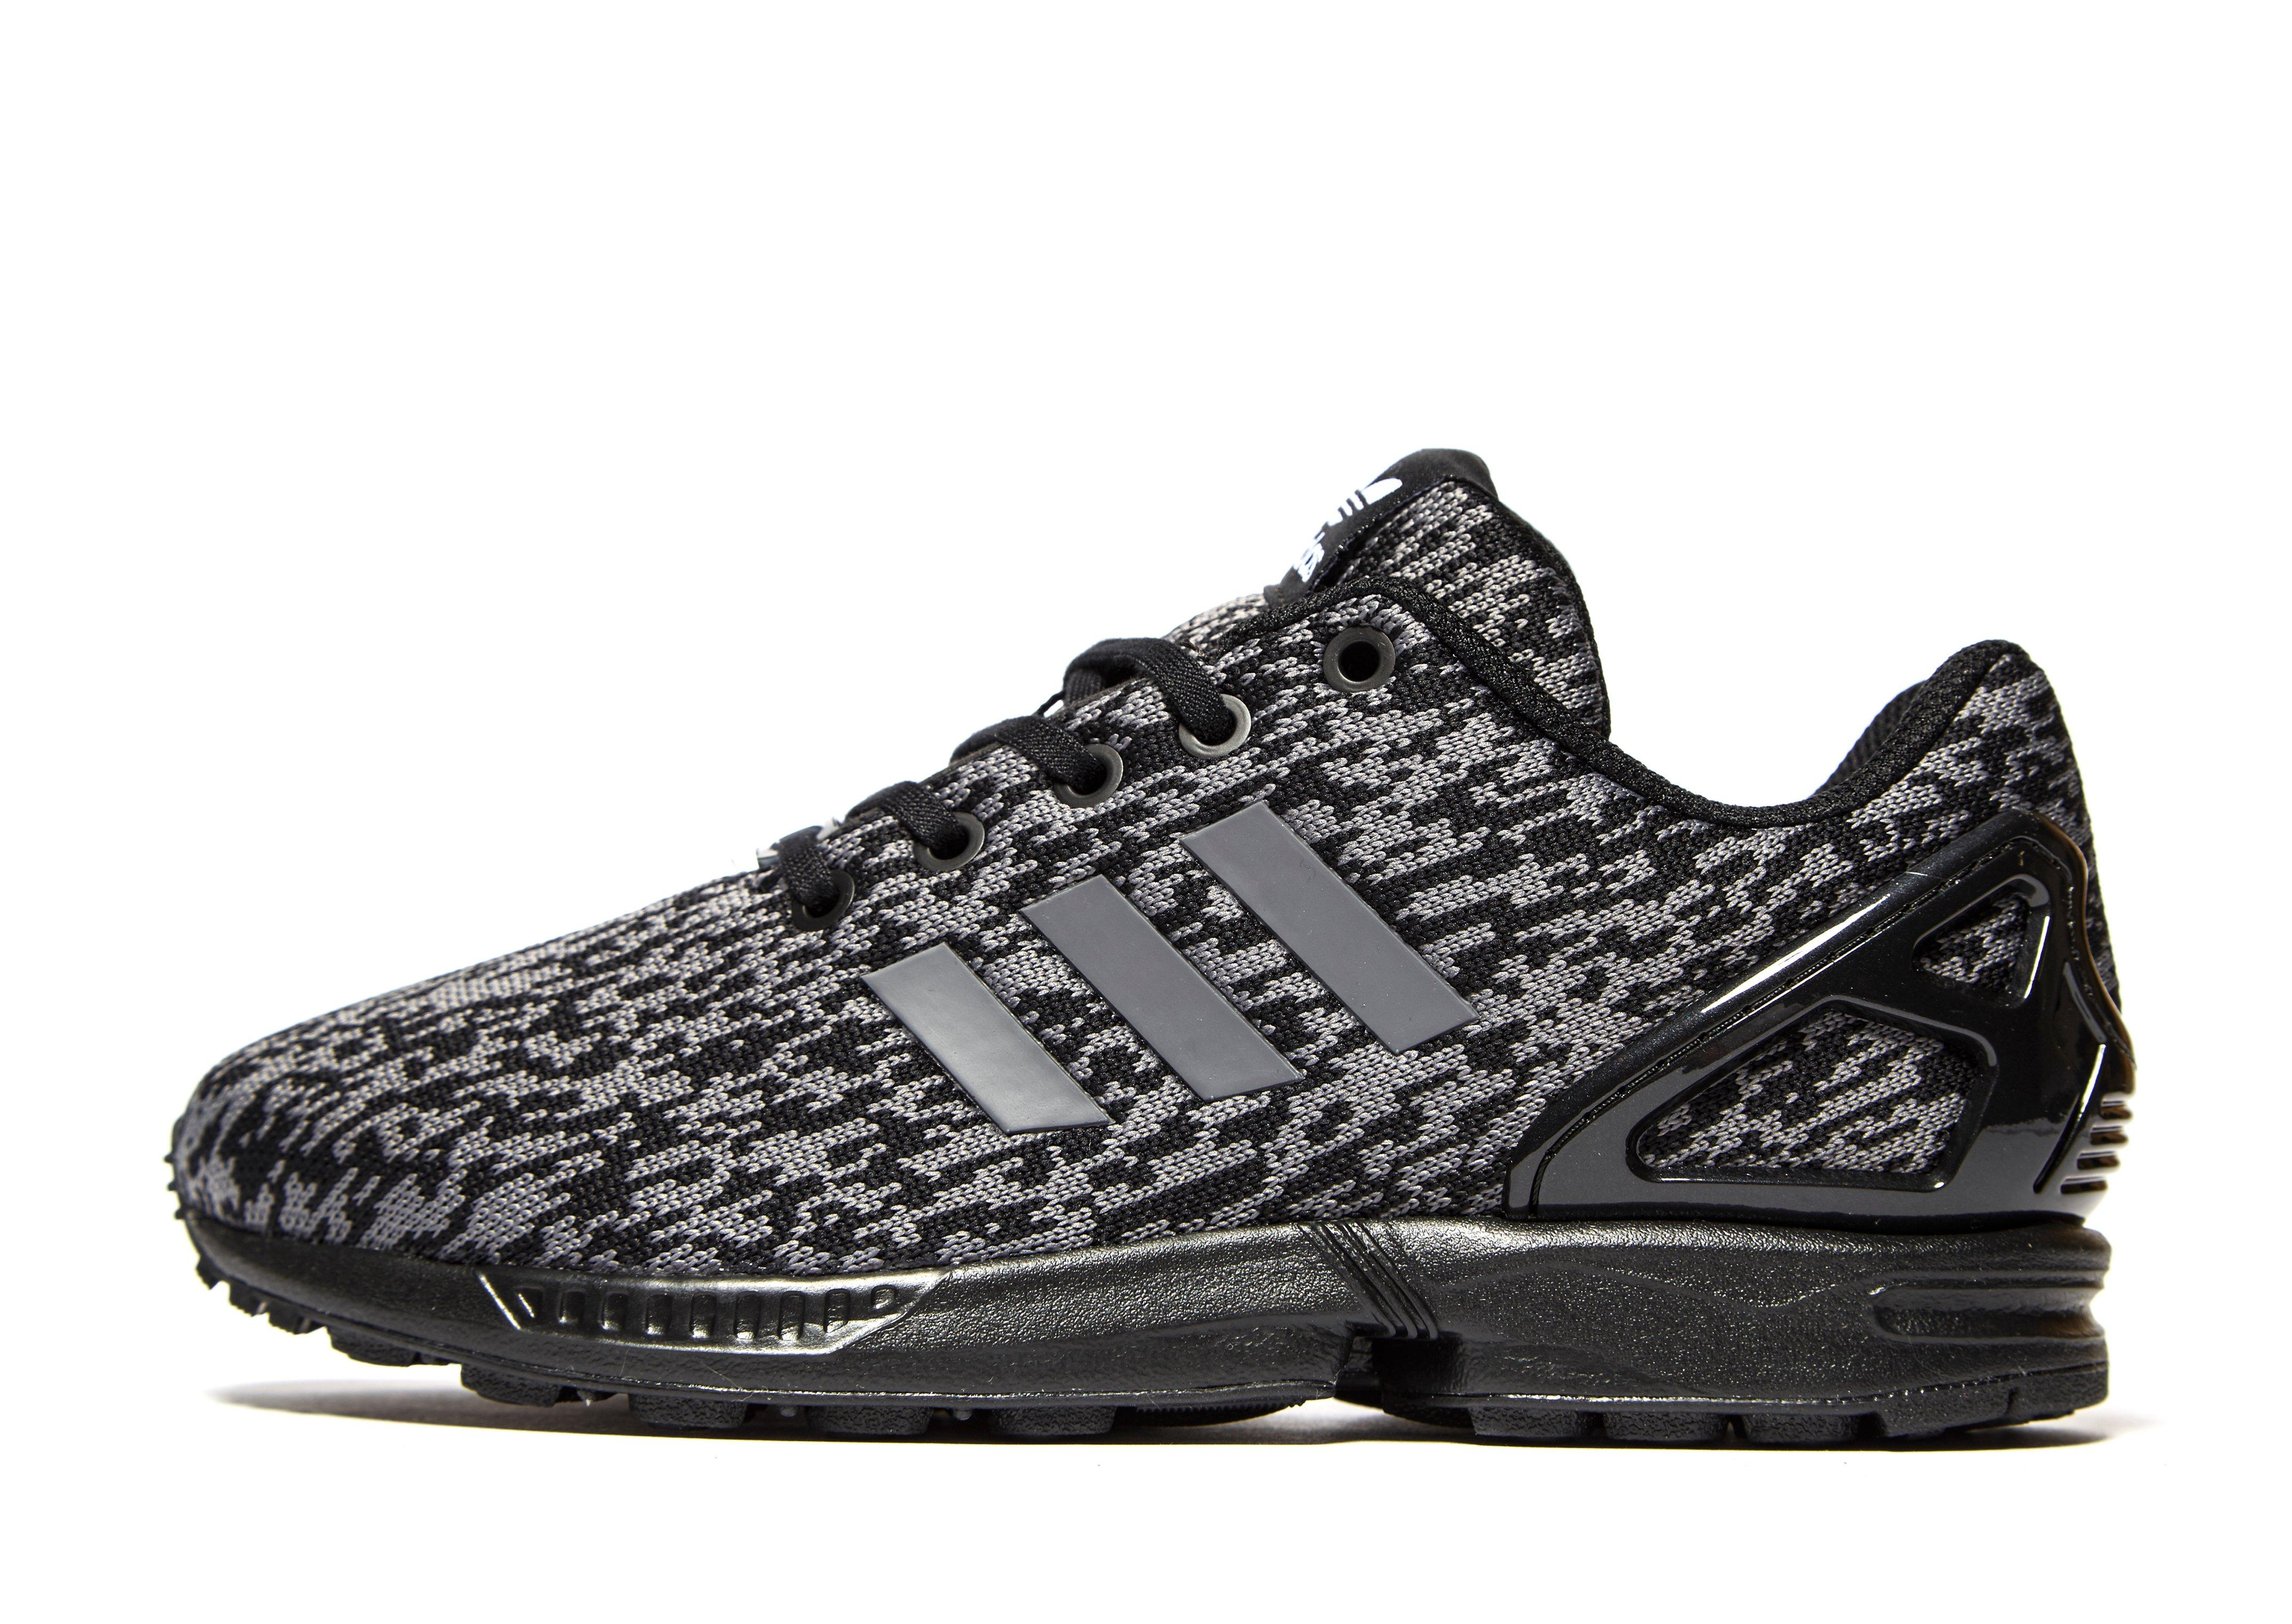 chaussure adidas 60 euros,adidas superstar chine,adidas zx